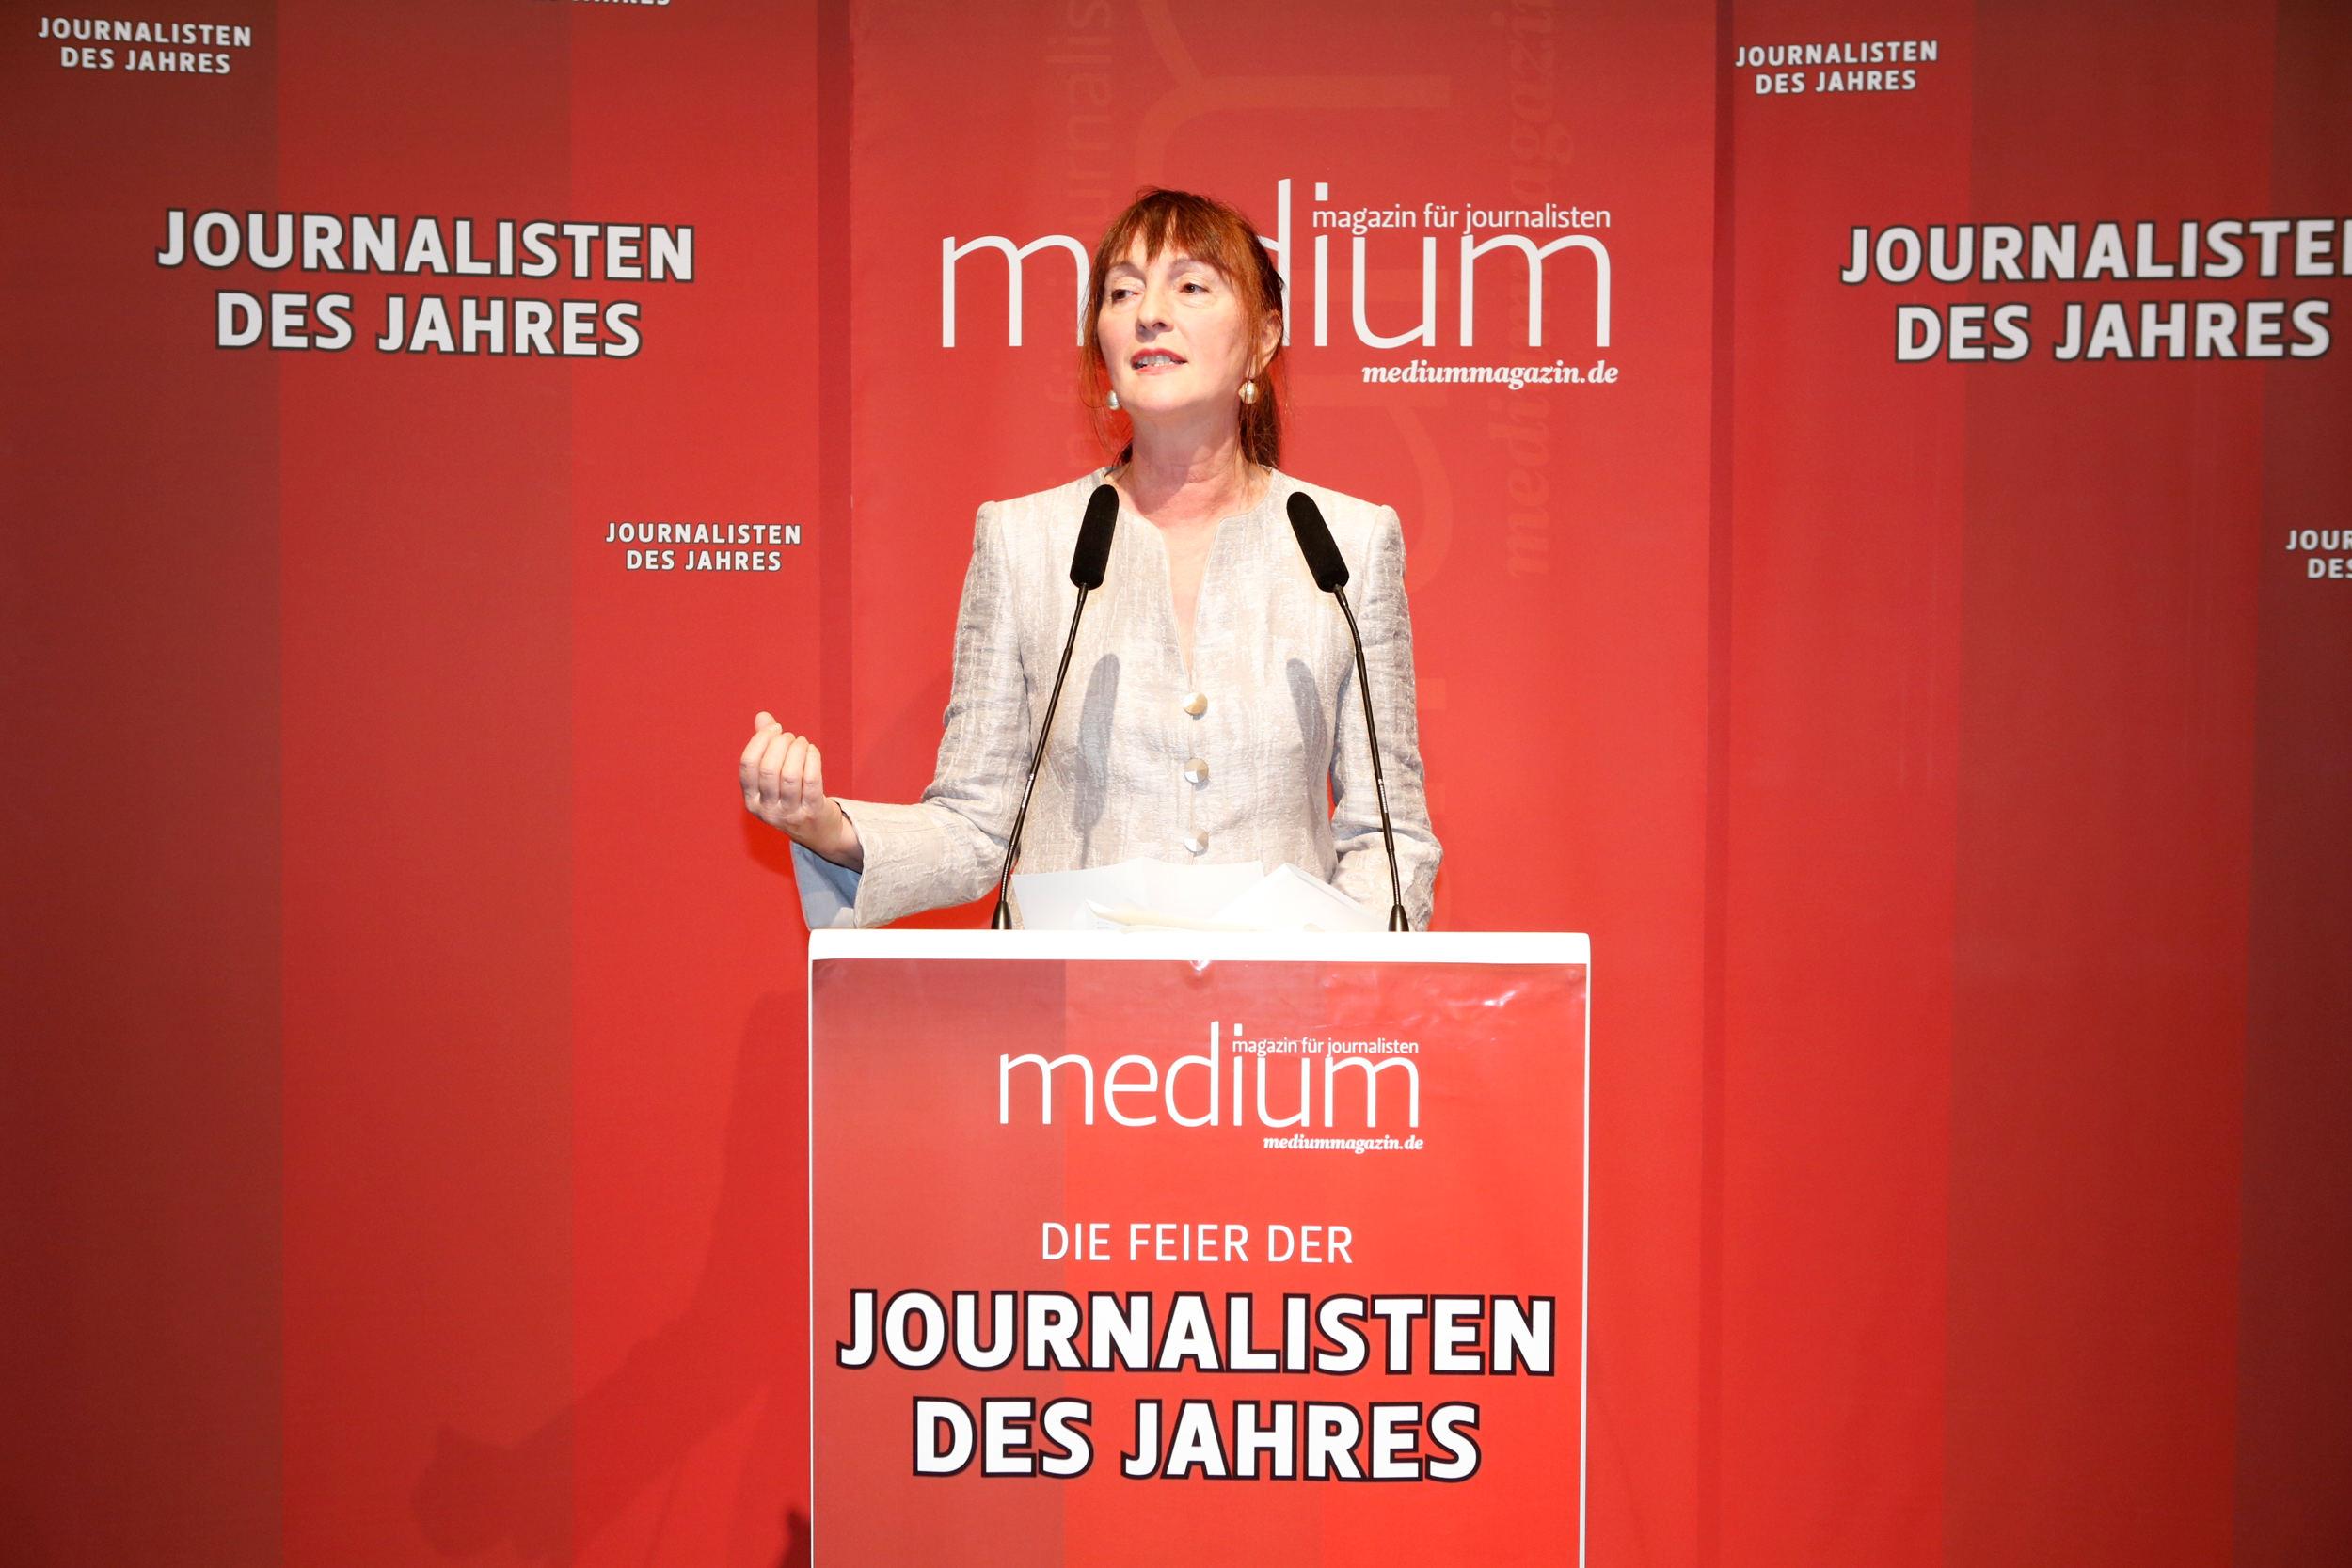 Sonia Seymour Mikich (WDR), Politik-Journalistin des Jahres 2012